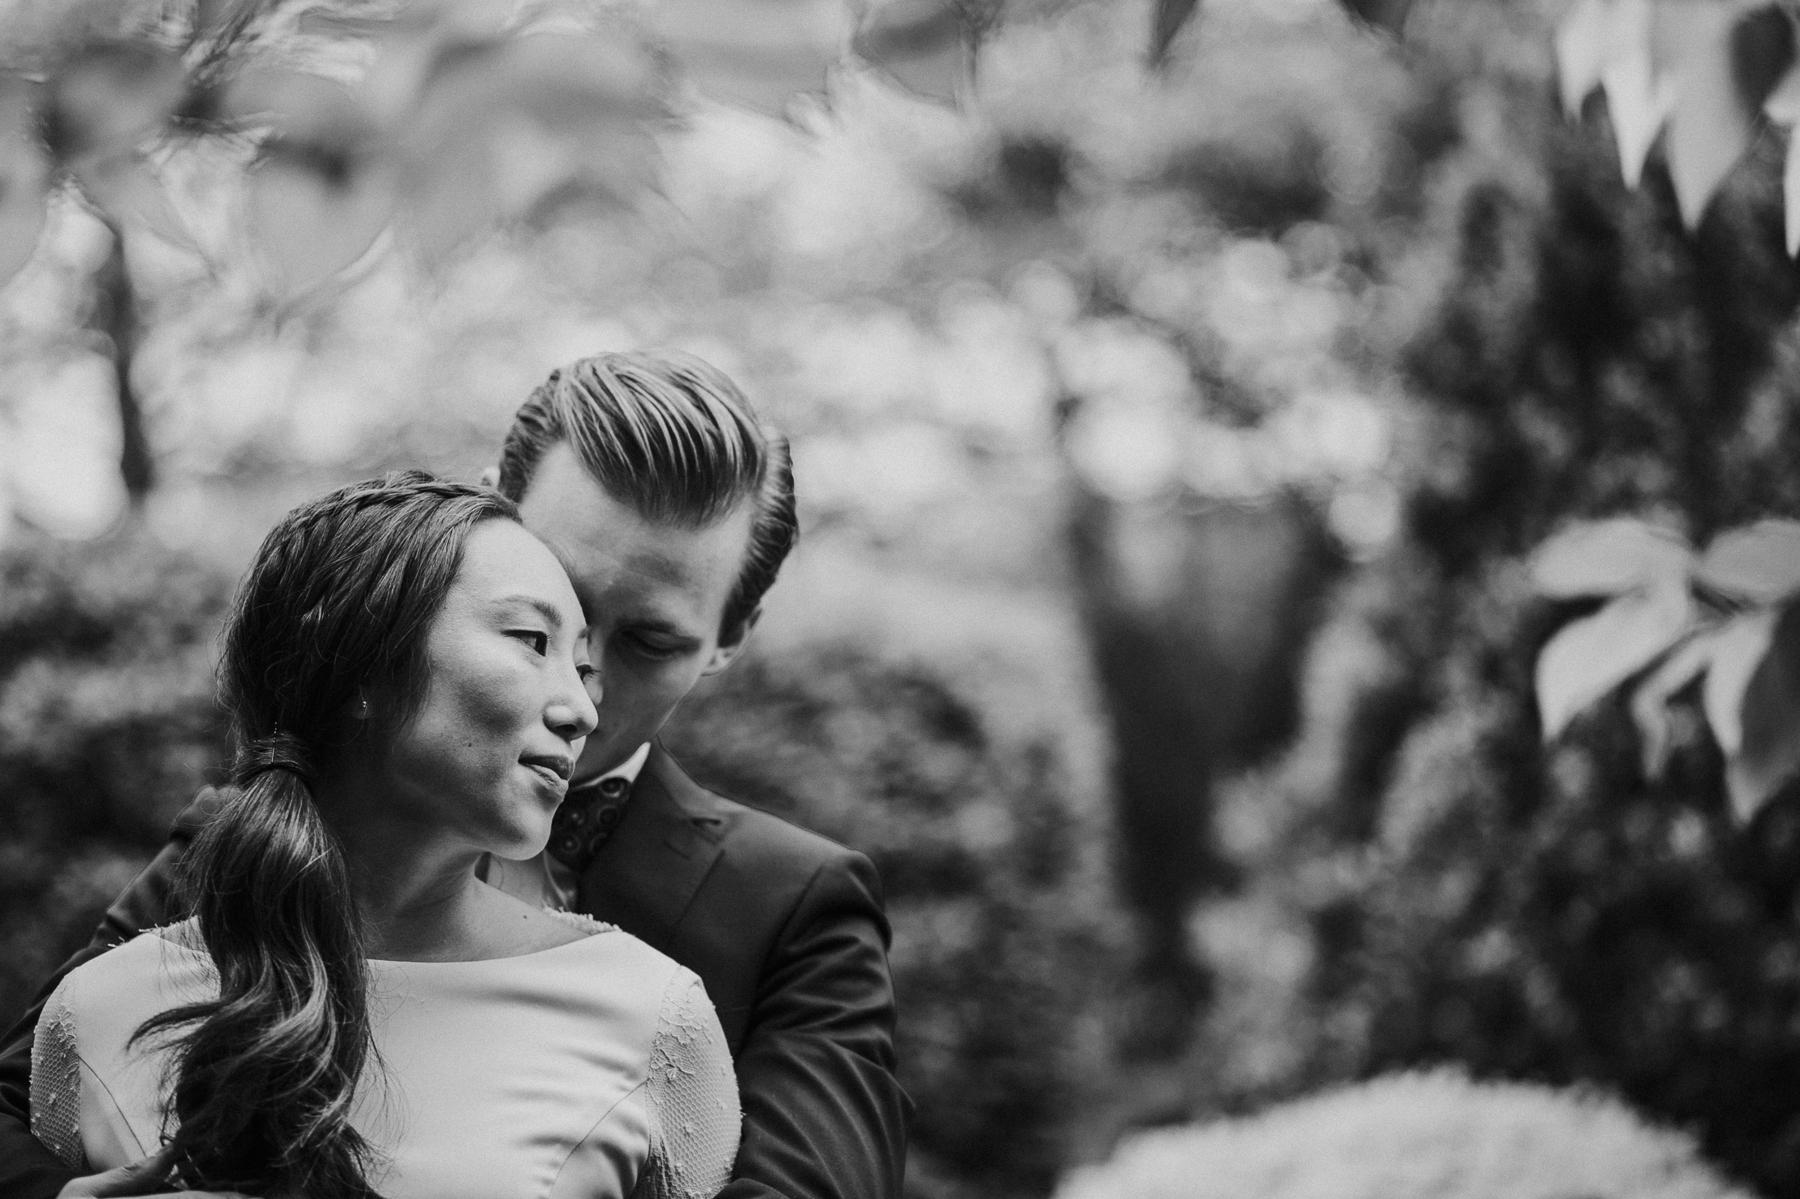 washington_dc_ceresville_mansion_wedding_photography 45.jpg